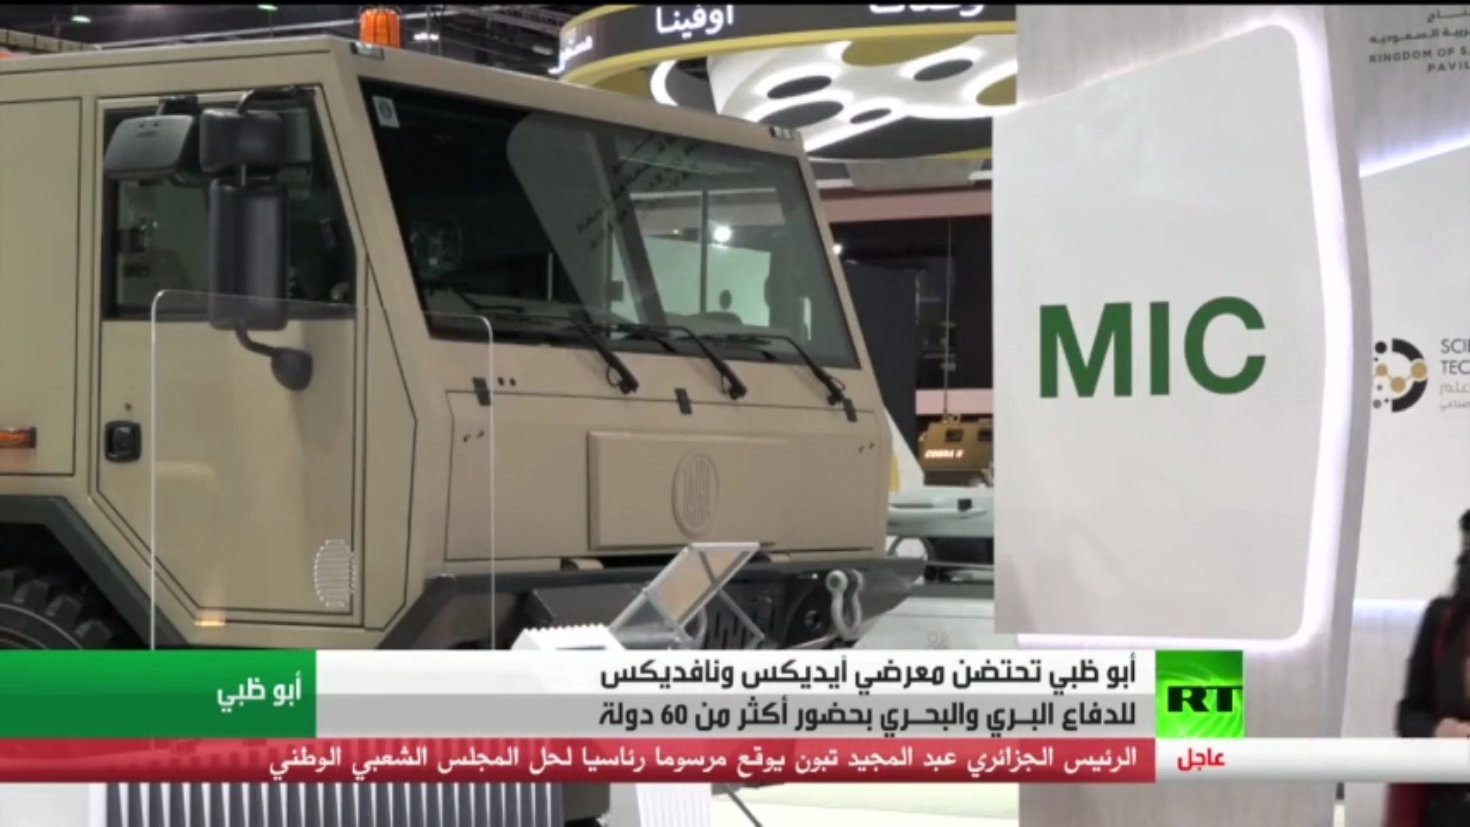 أبو ظبي تحتضن معرضي آيديكس ونافديكس